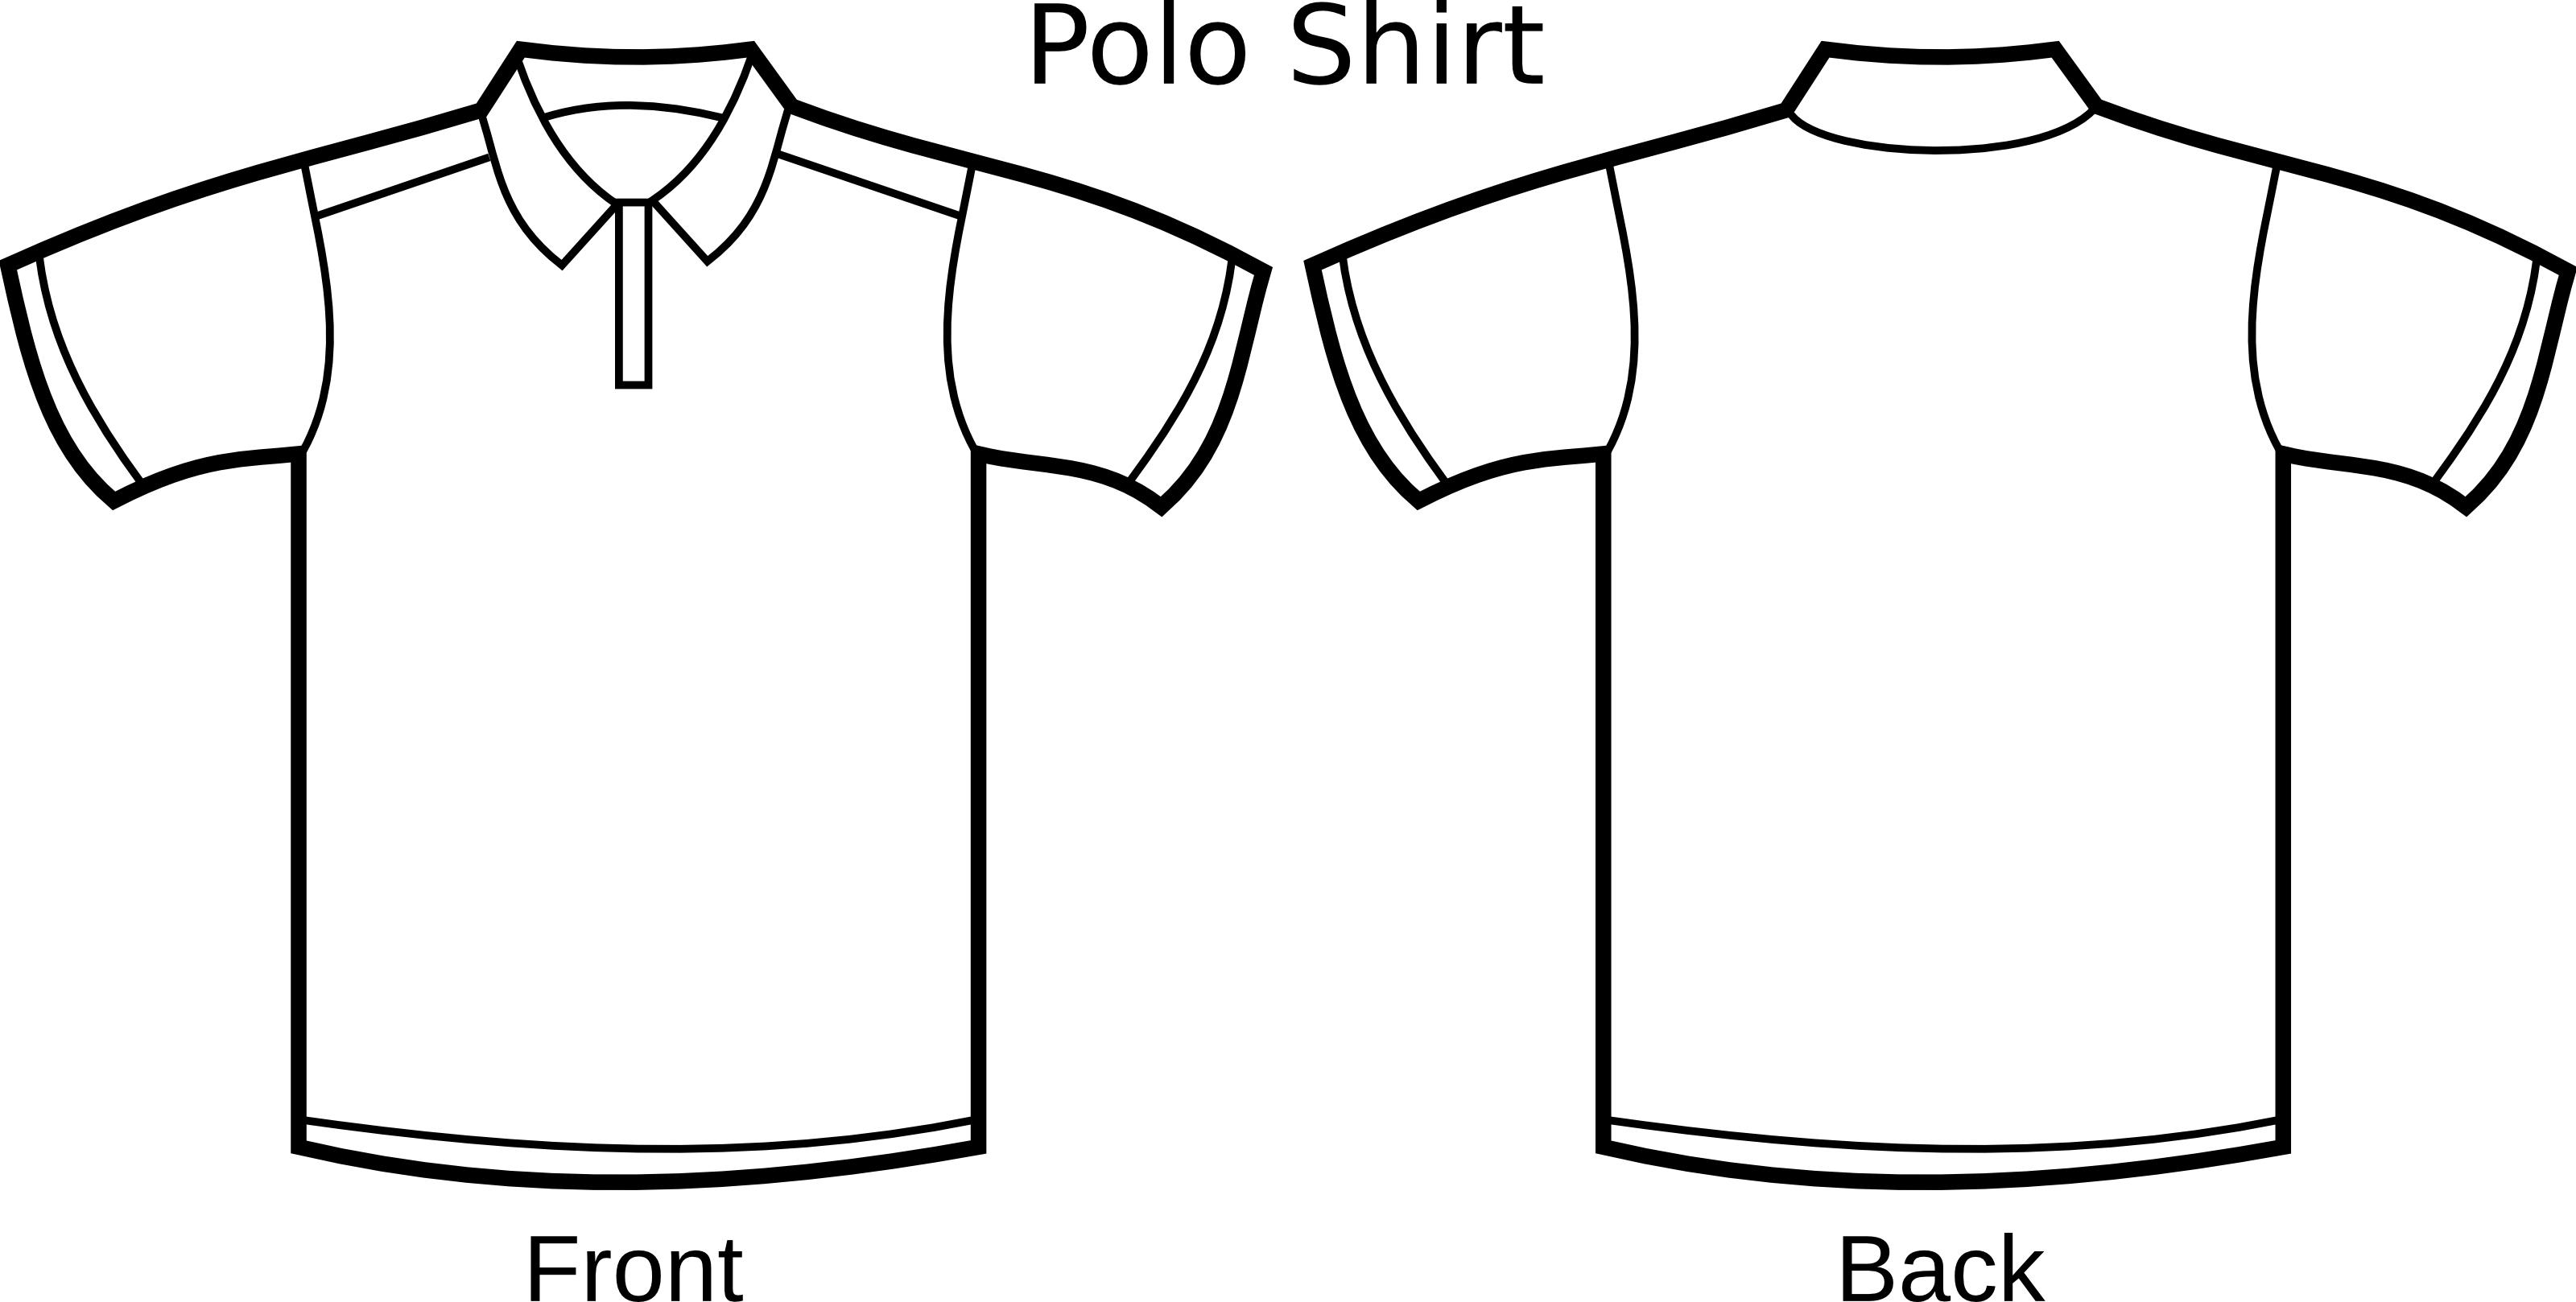 Free Polo Shirt Template Clipart Illustr-Free Polo Shirt Template Clipart Illustration #000155 .-5